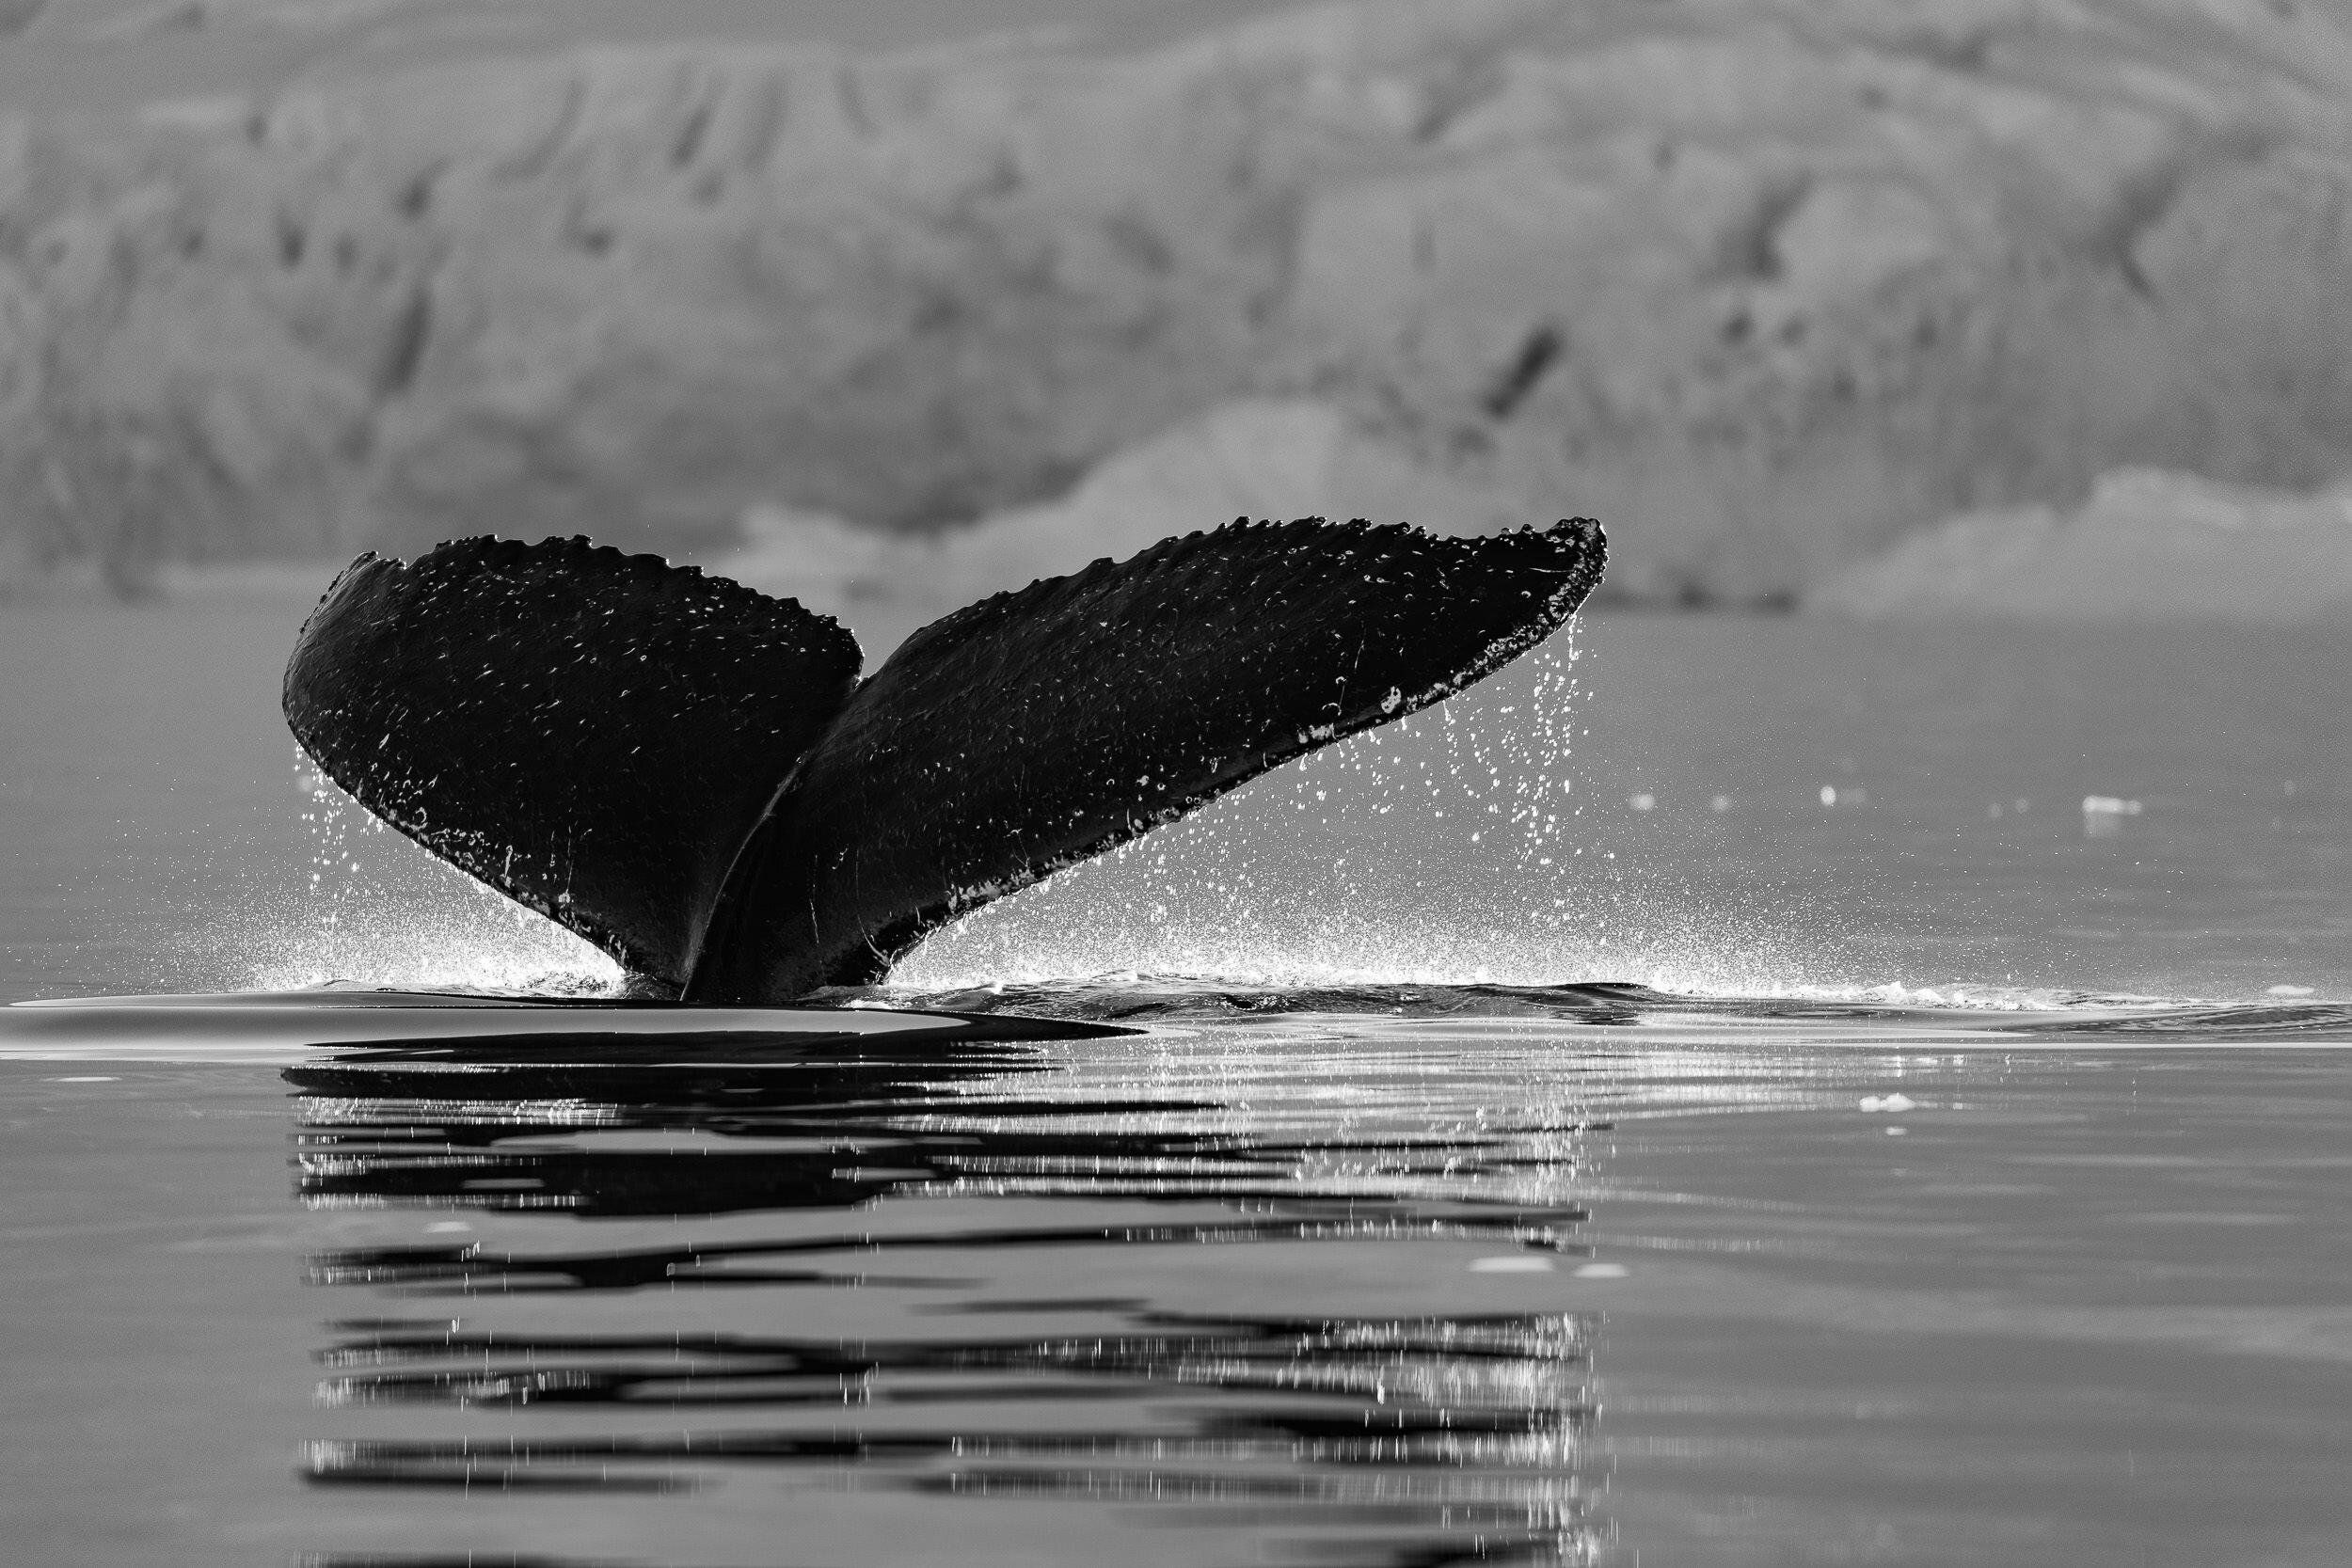 AmandaHiemstra-whale-fluke-antarctica.jpg